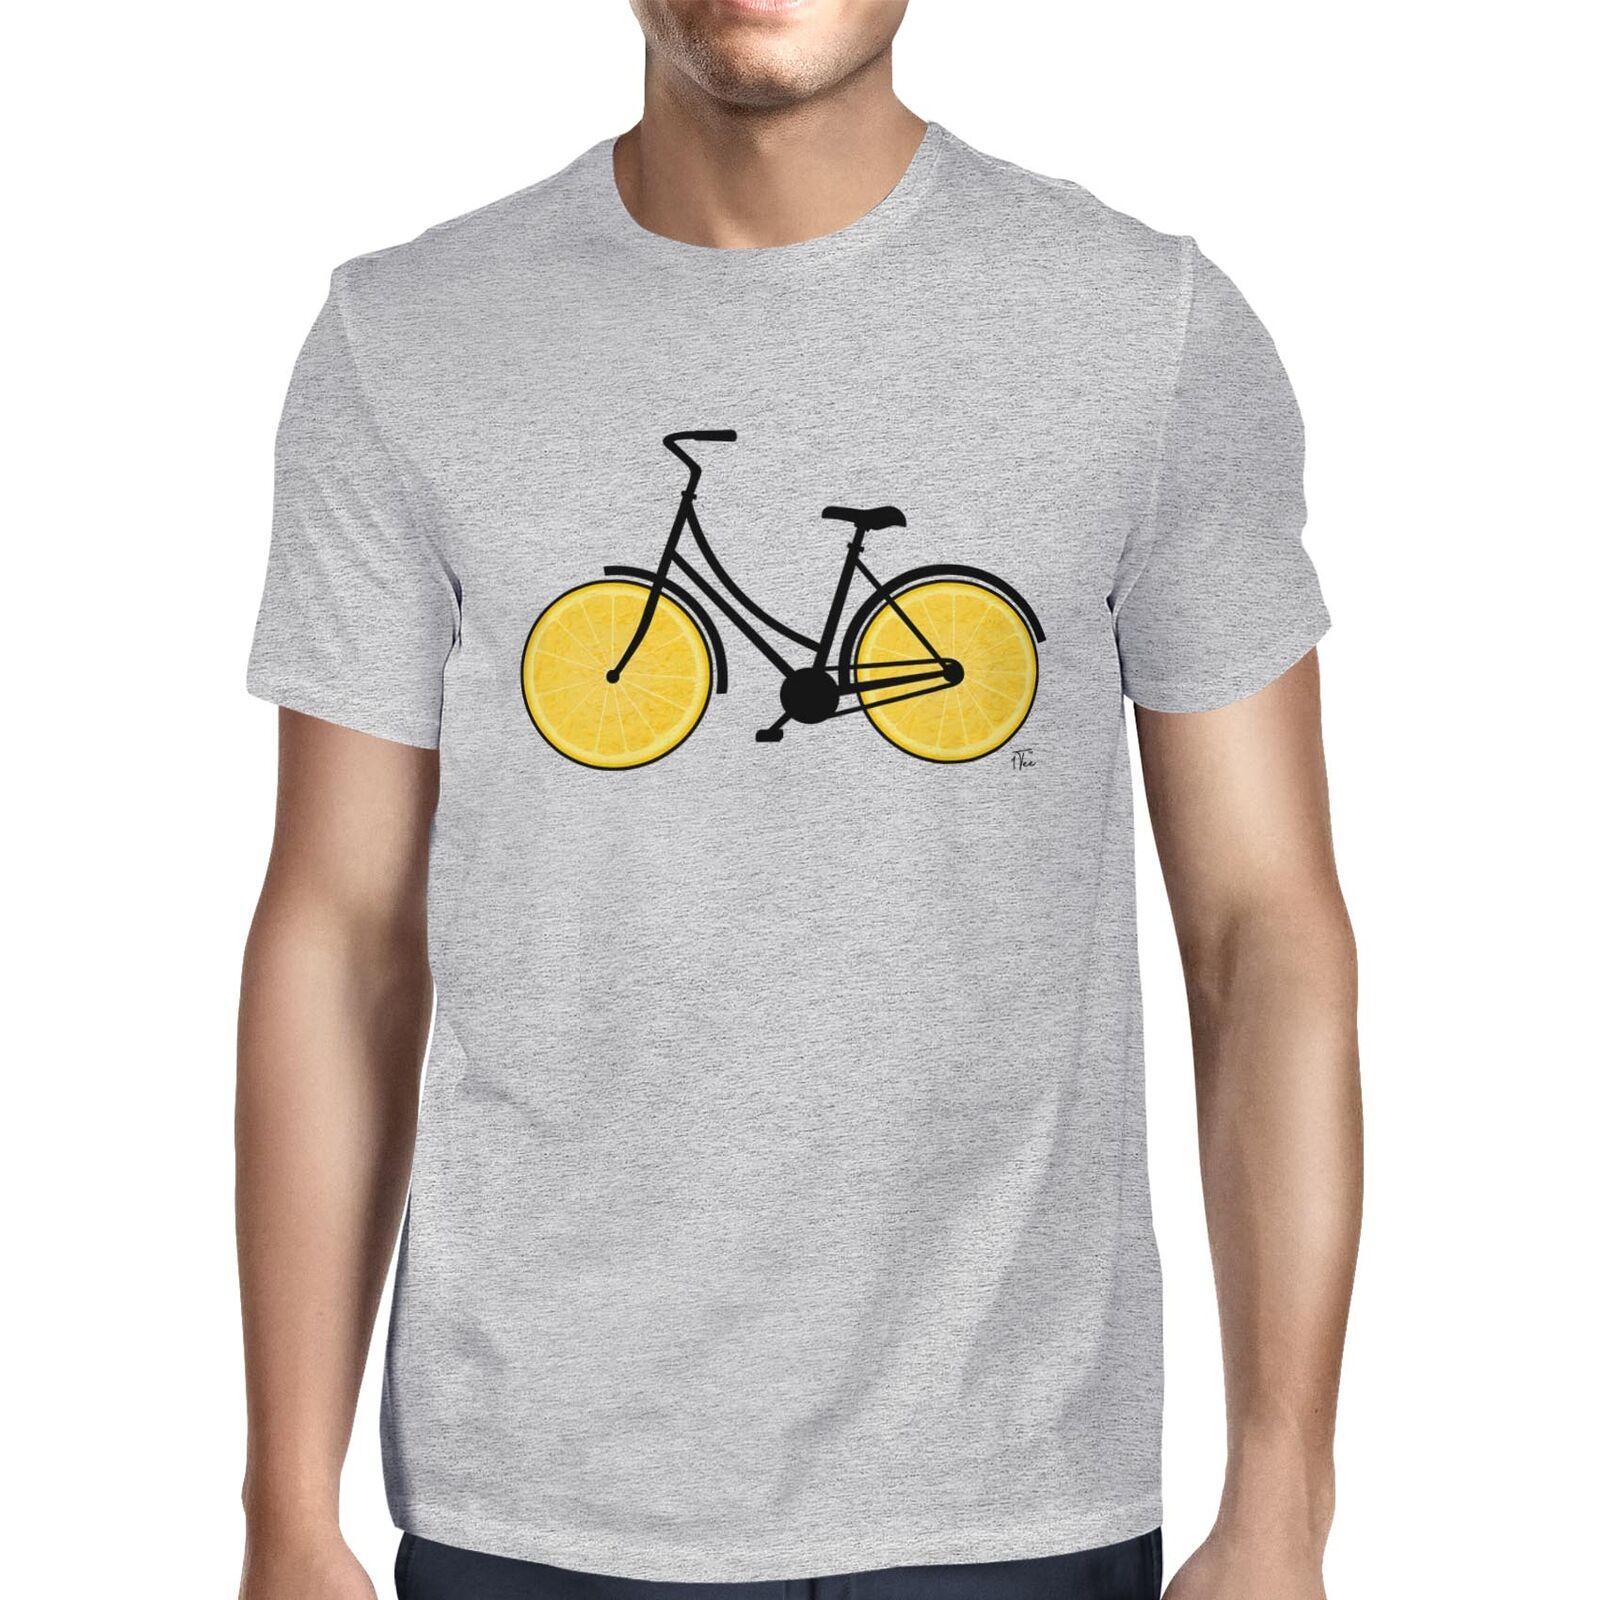 1Tee Mens Zesty Lemon ruedas bicicleta camiseta